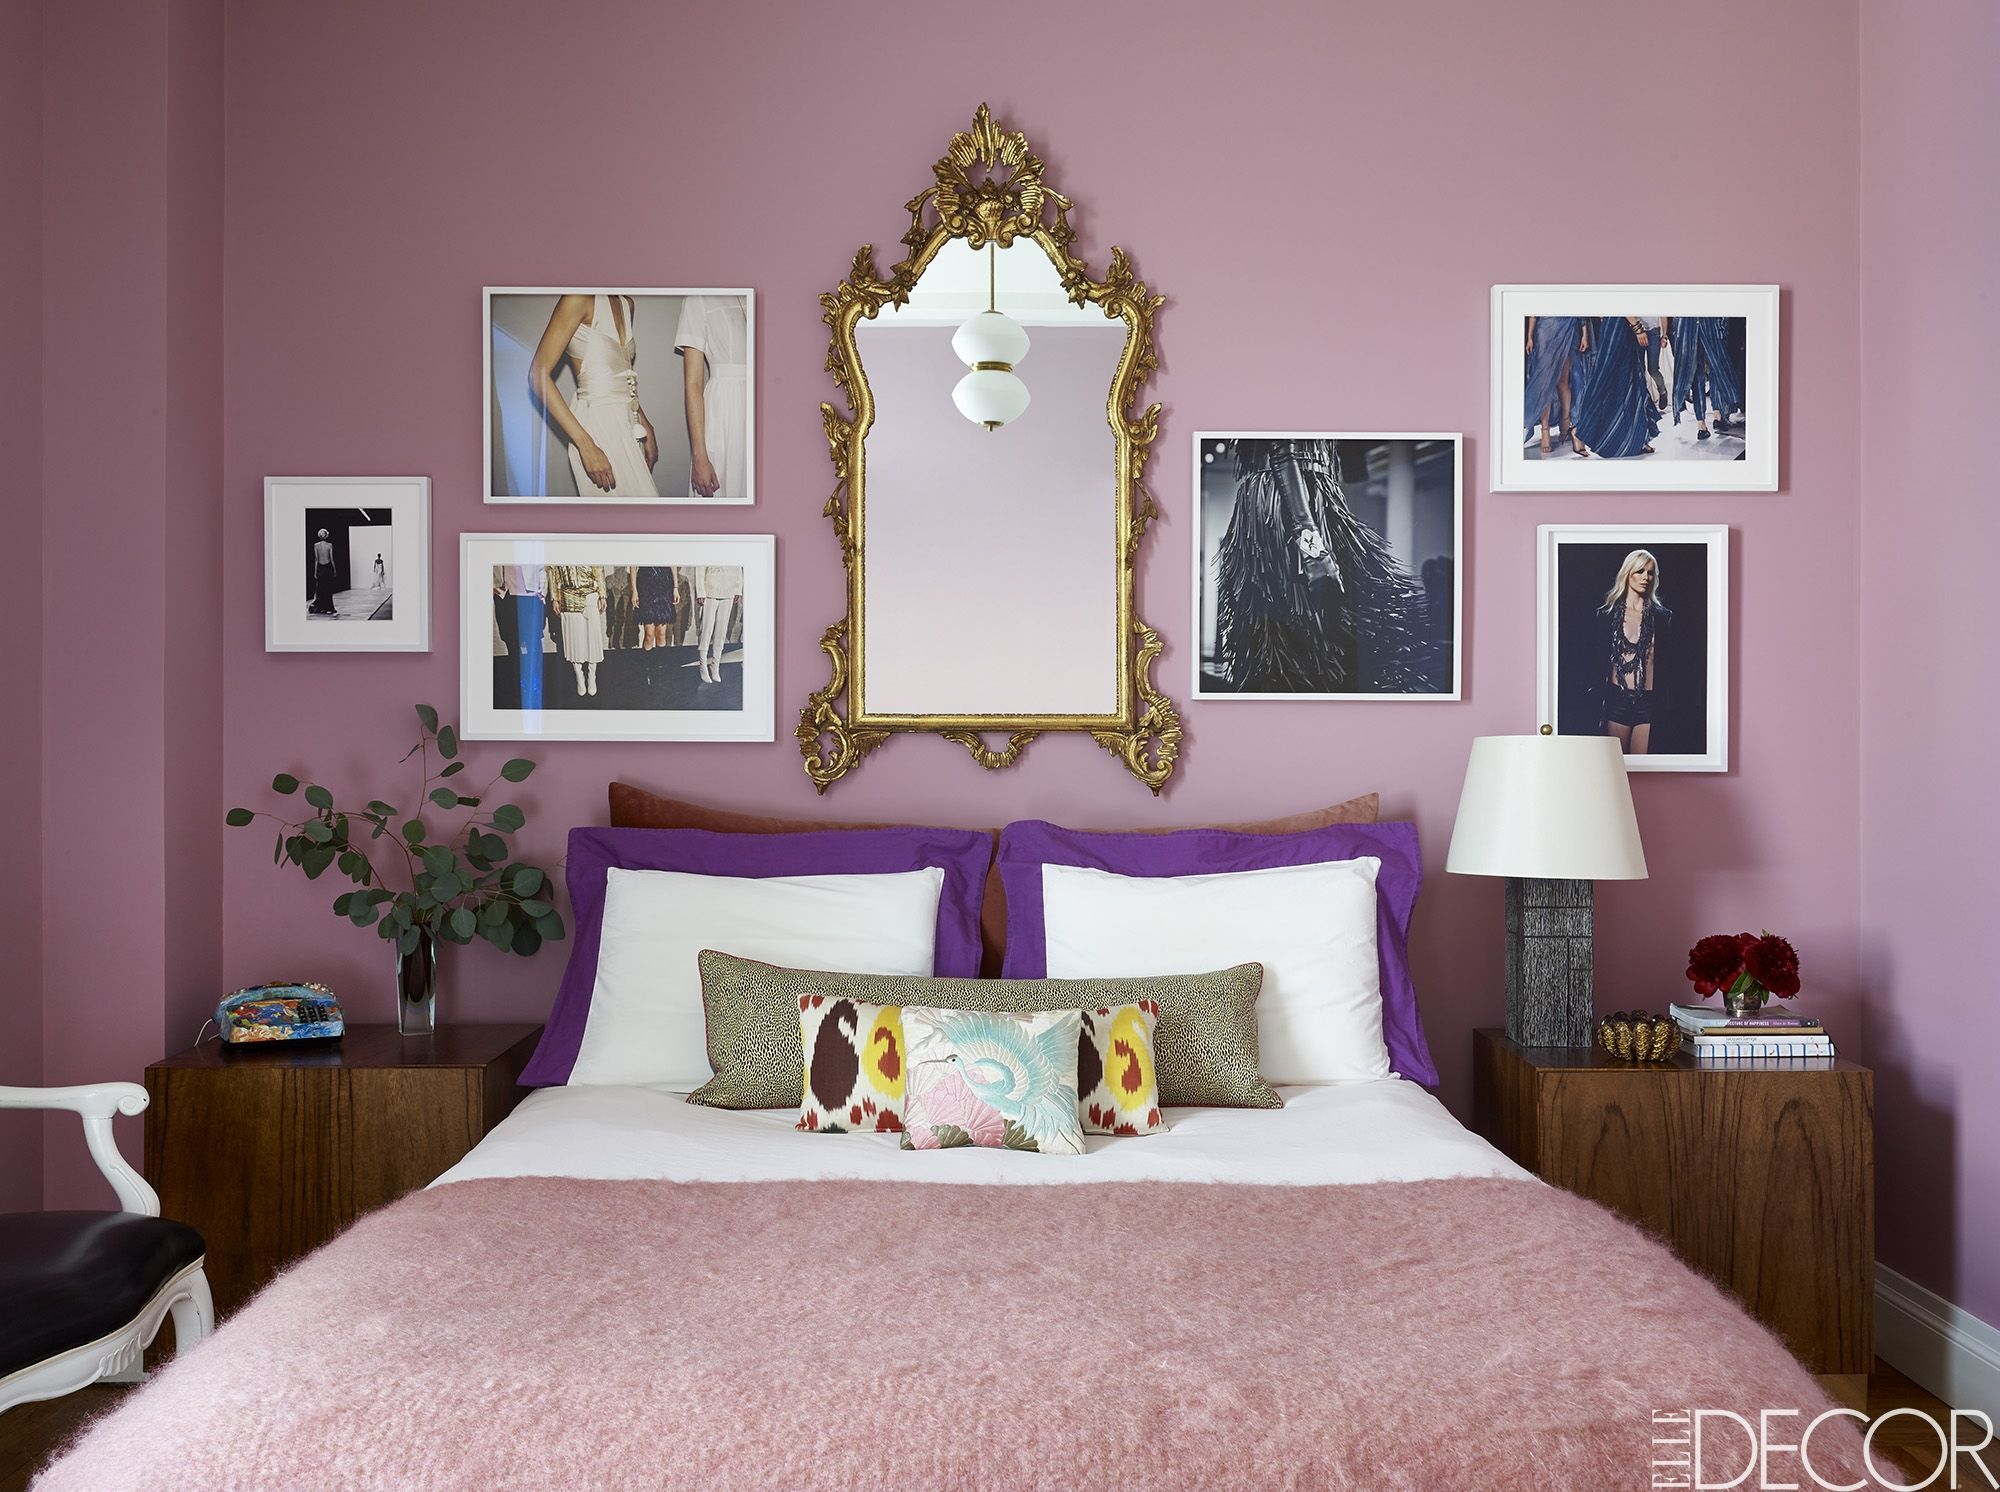 25 purple room decorating ideas how